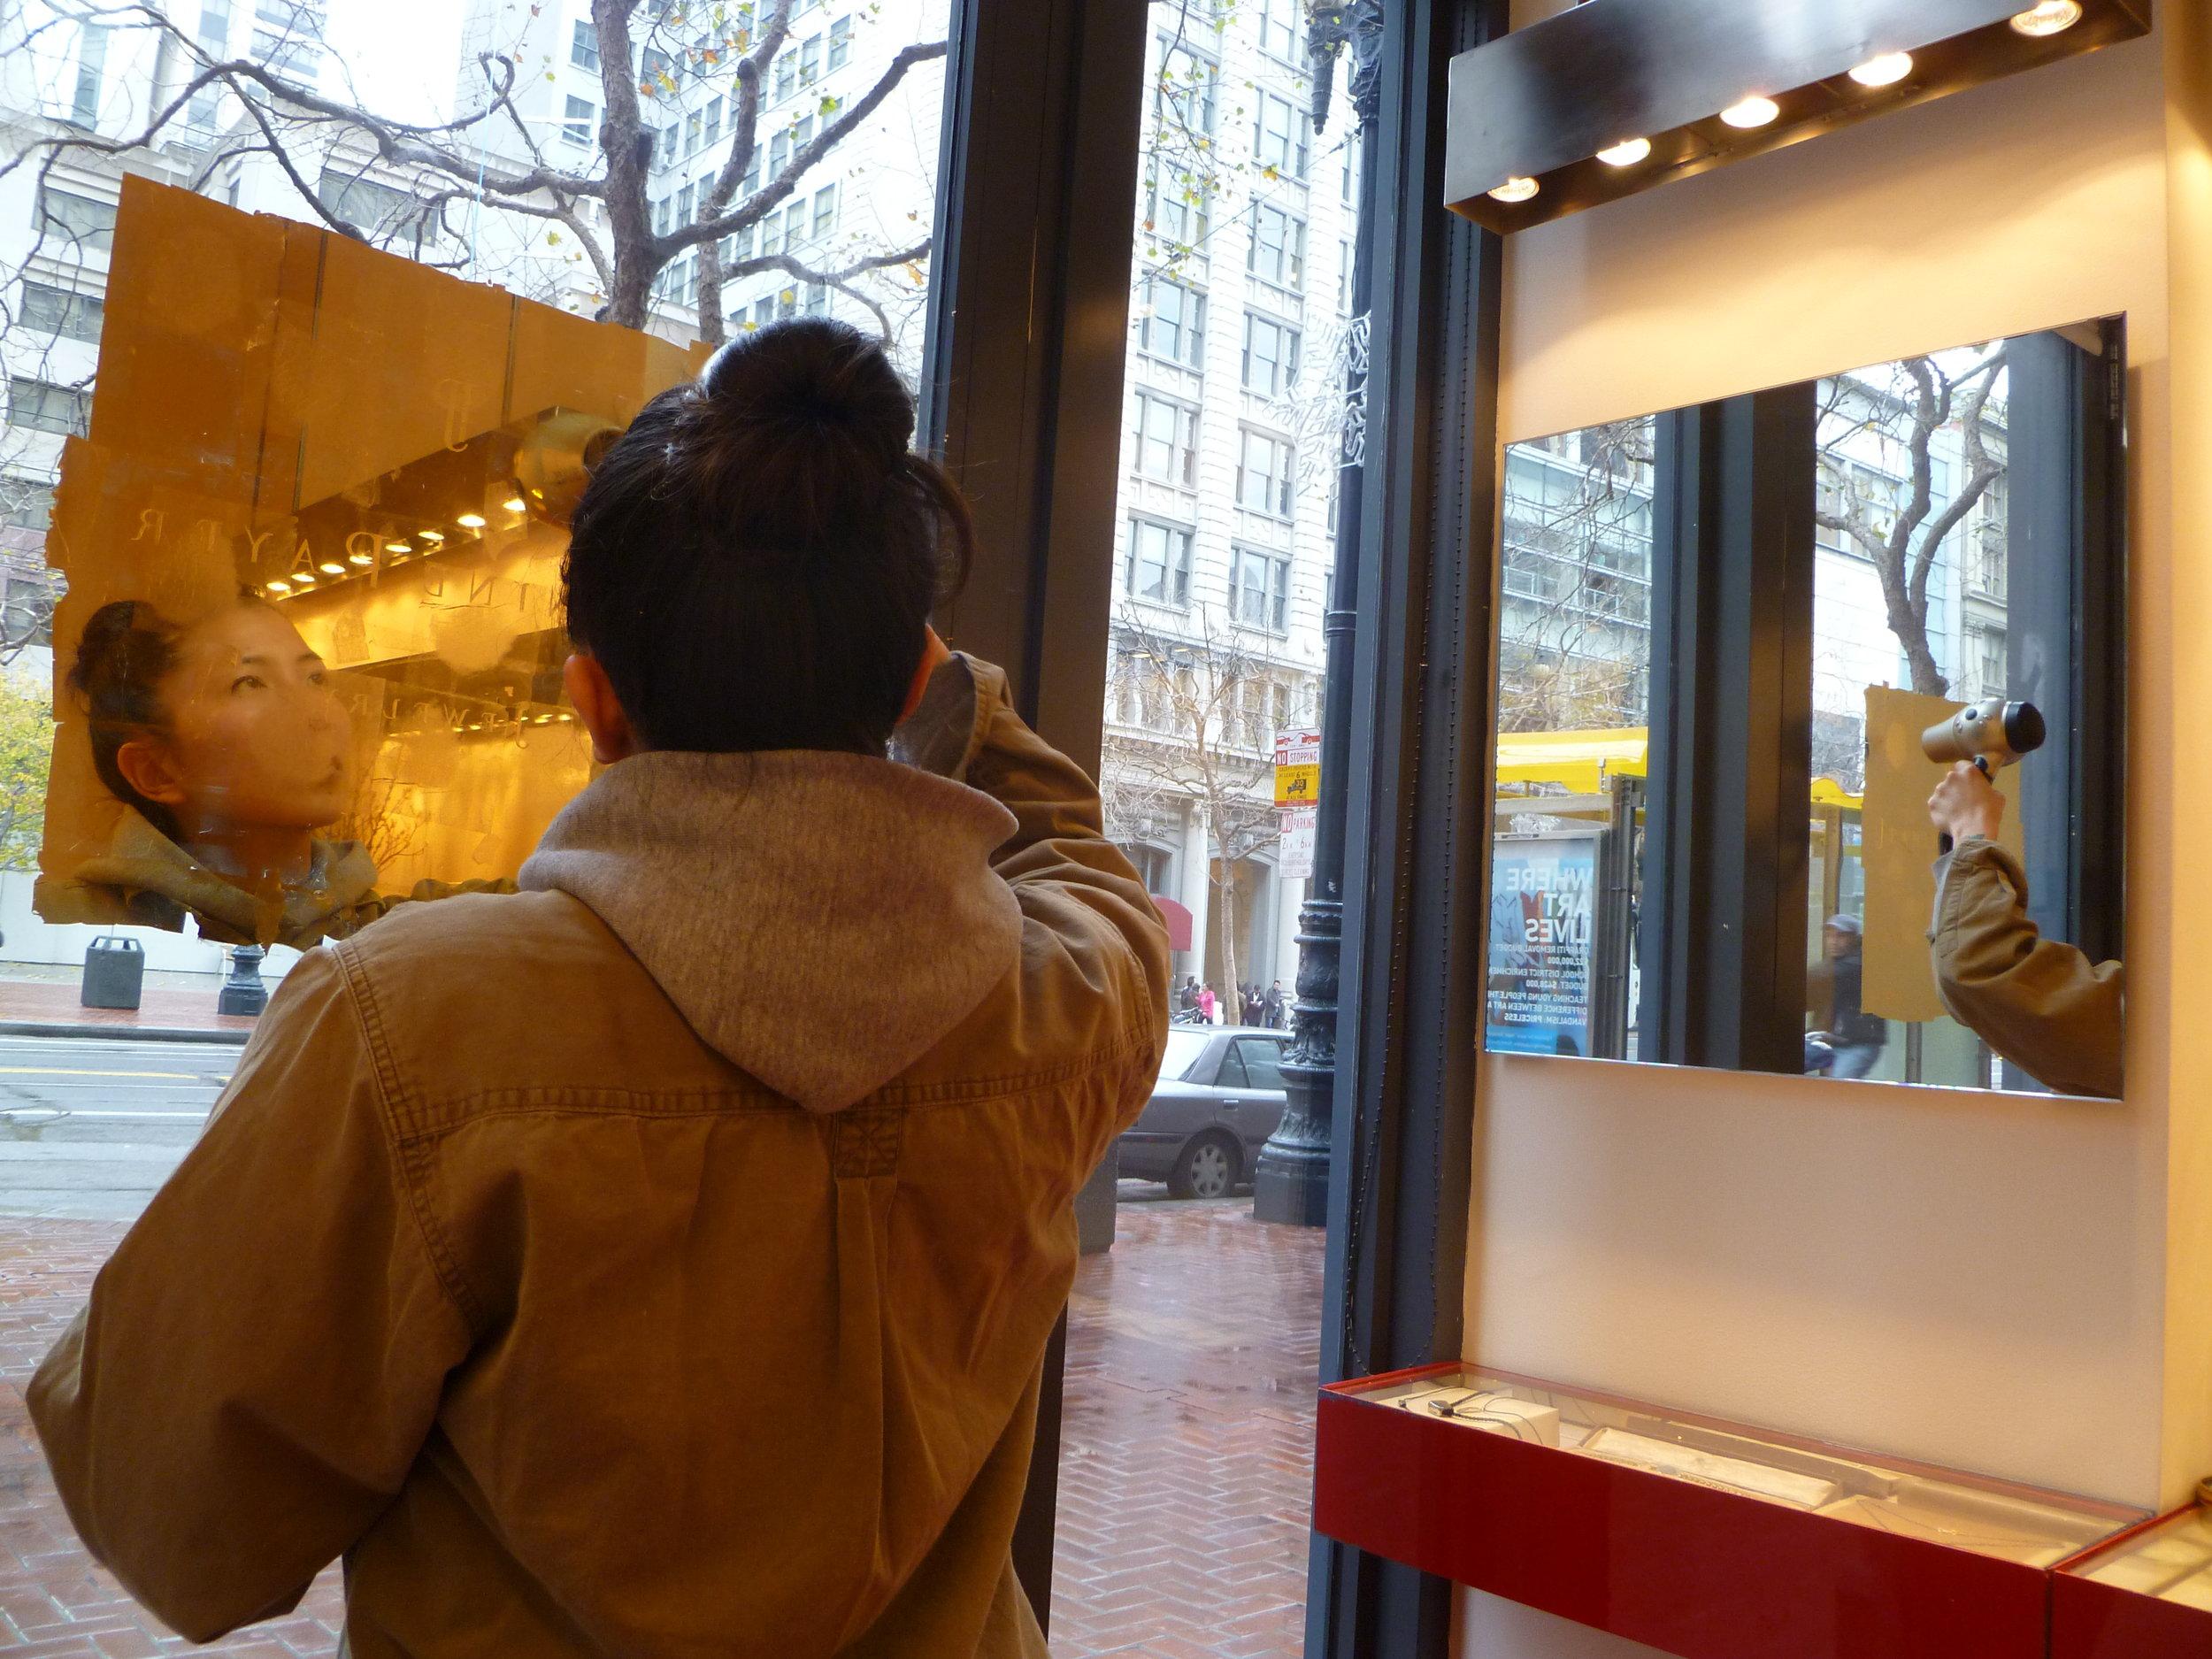 GOLD-11-january-2011_5352743161_o.jpg